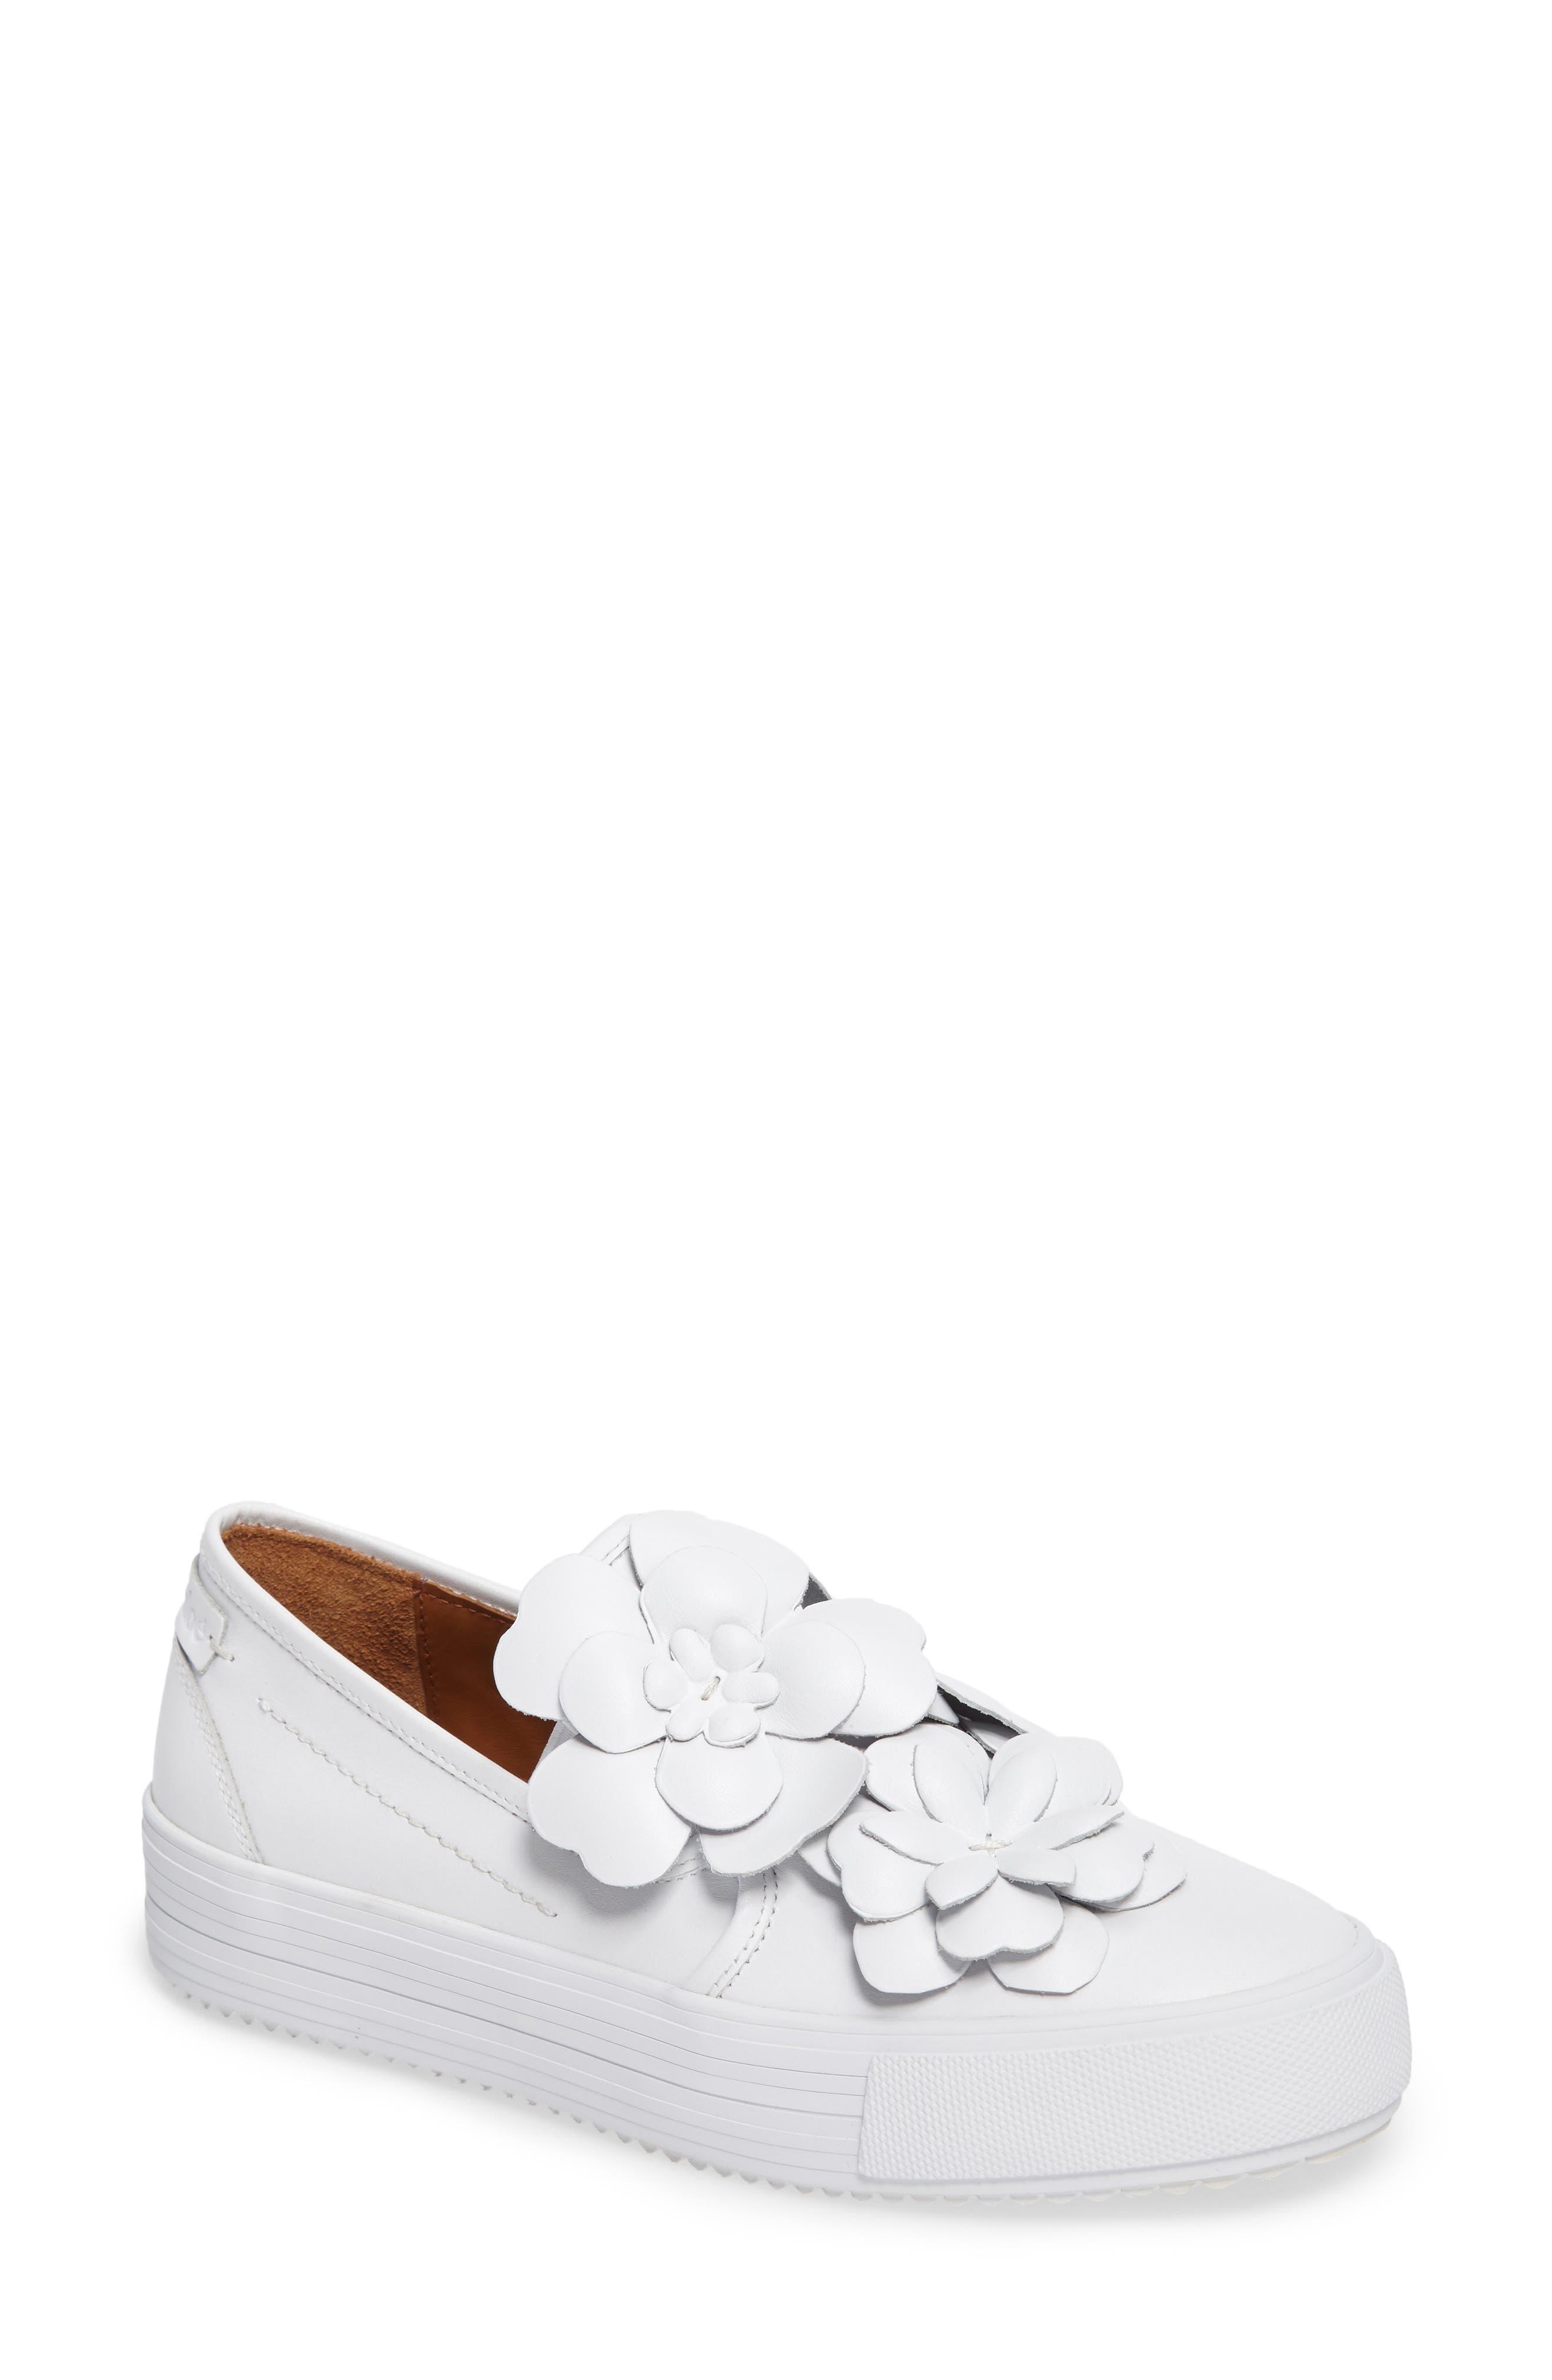 Vera Floral Appliqué Slip-On Sneaker,                         Main,                         color, WHITE